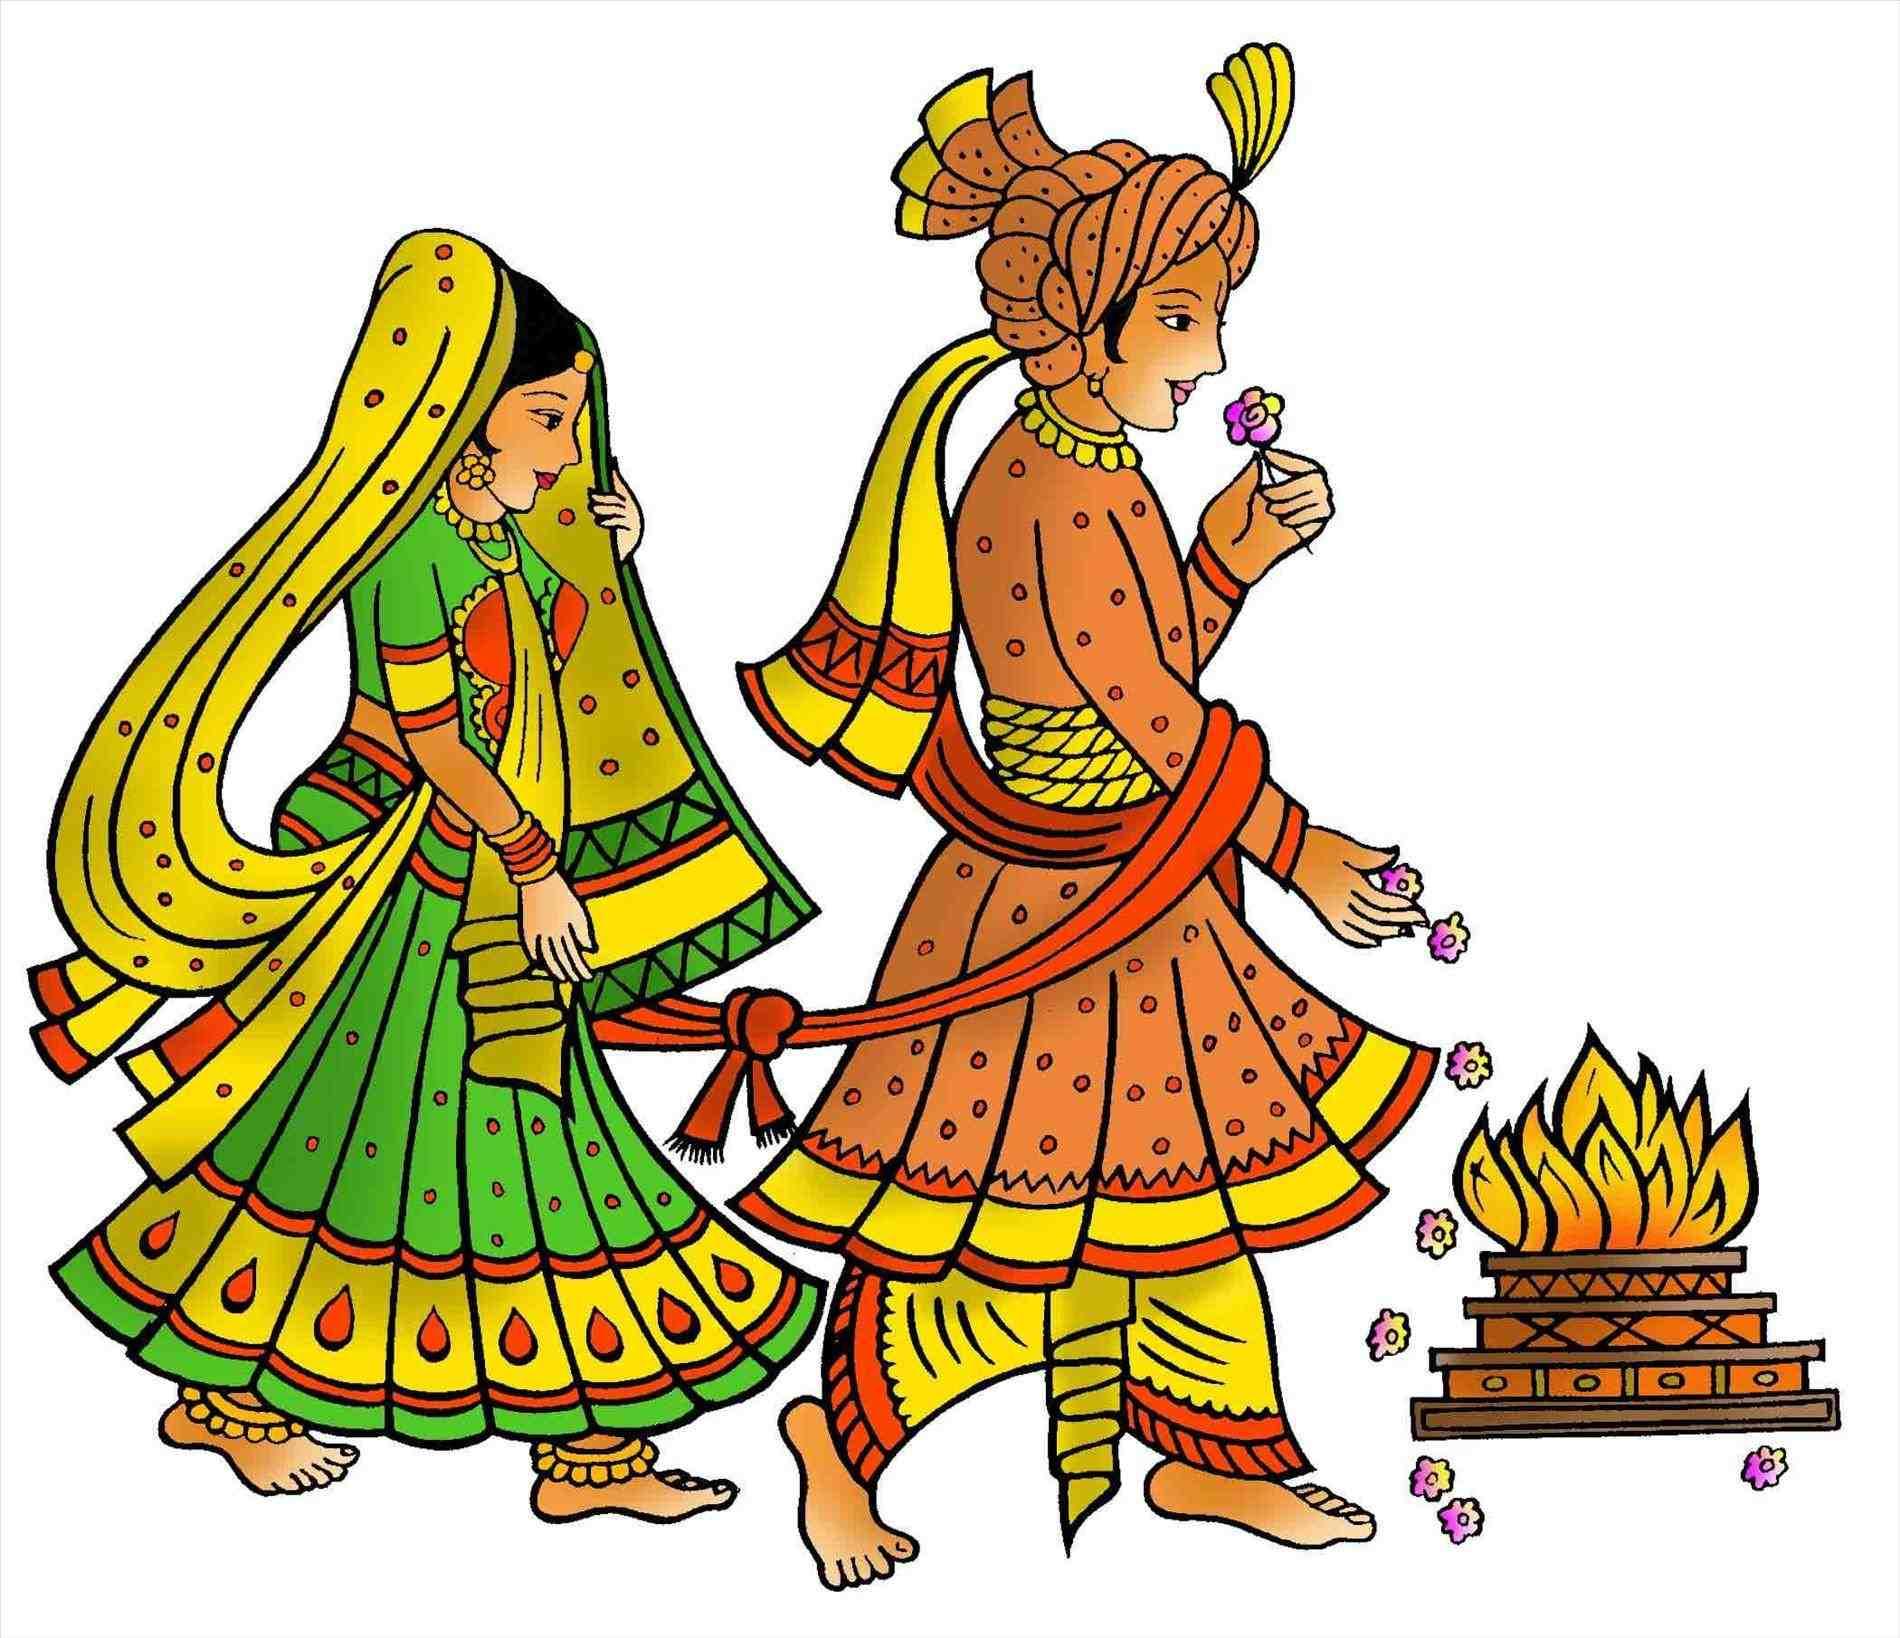 Hindu Clipart at GetDrawings.com.